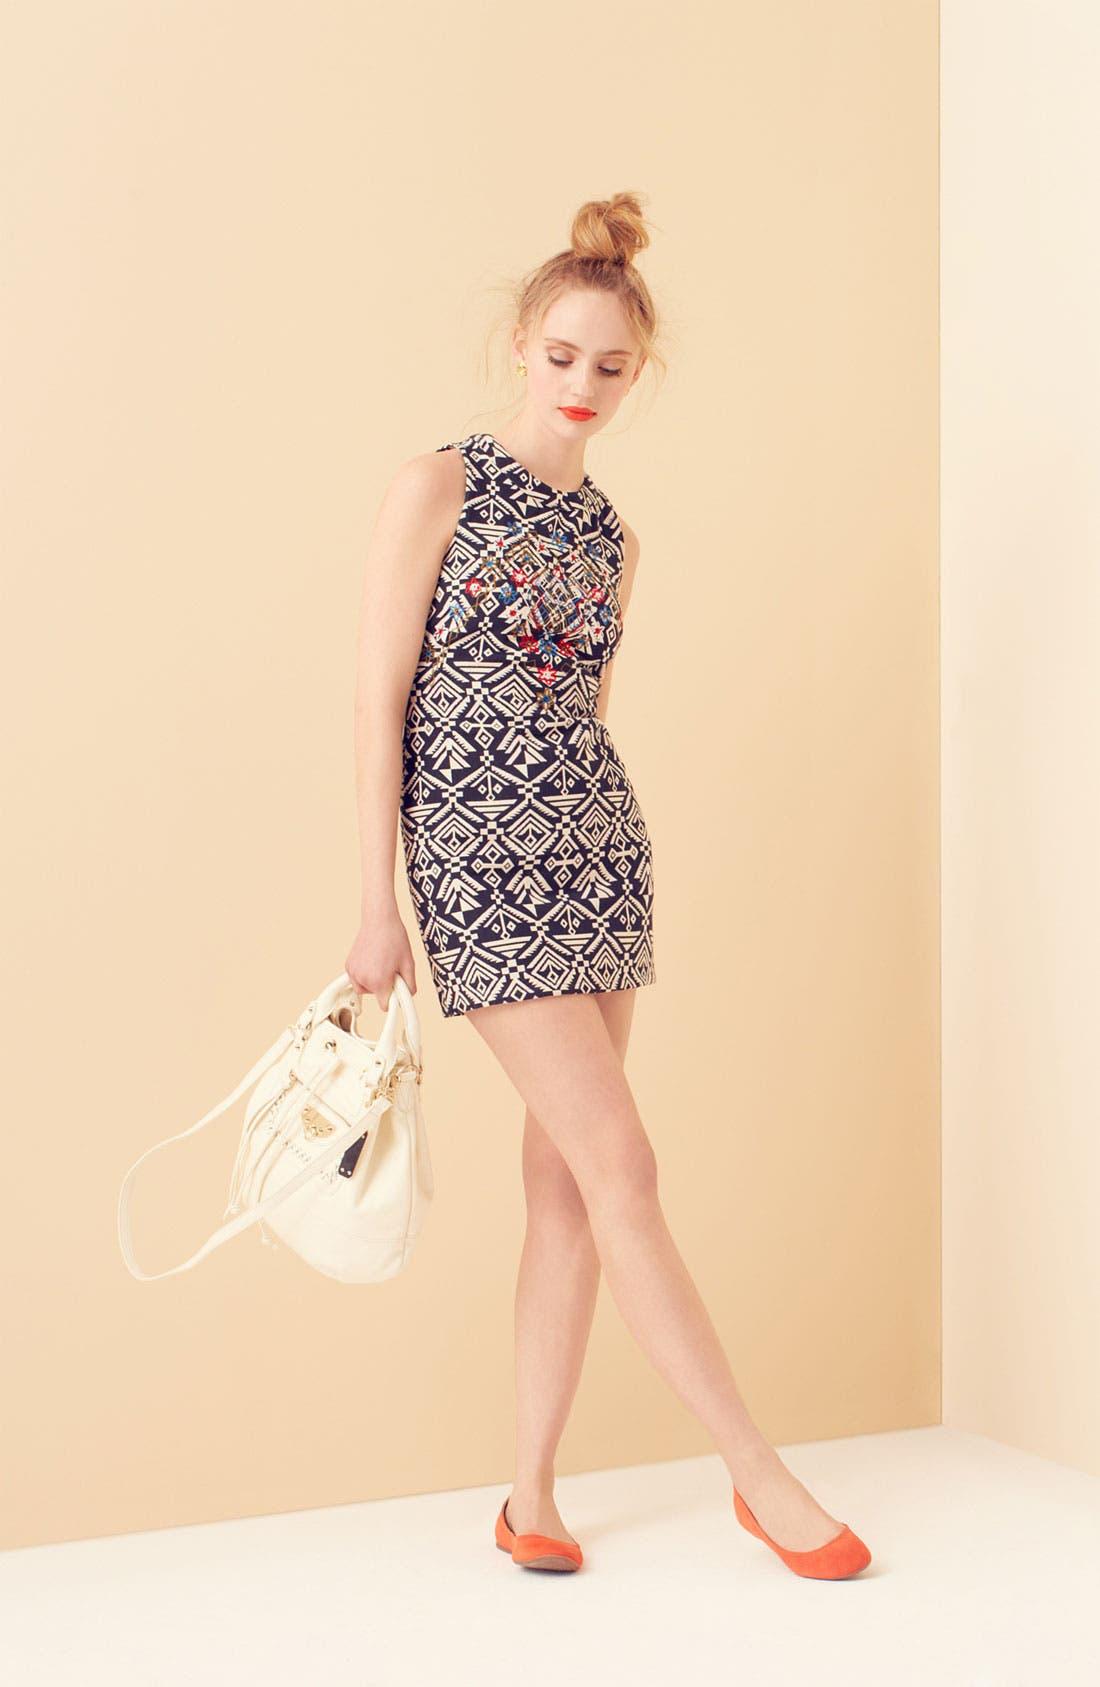 Main Image - ASTR Embroidered Minidress & Sam Edelman Flat